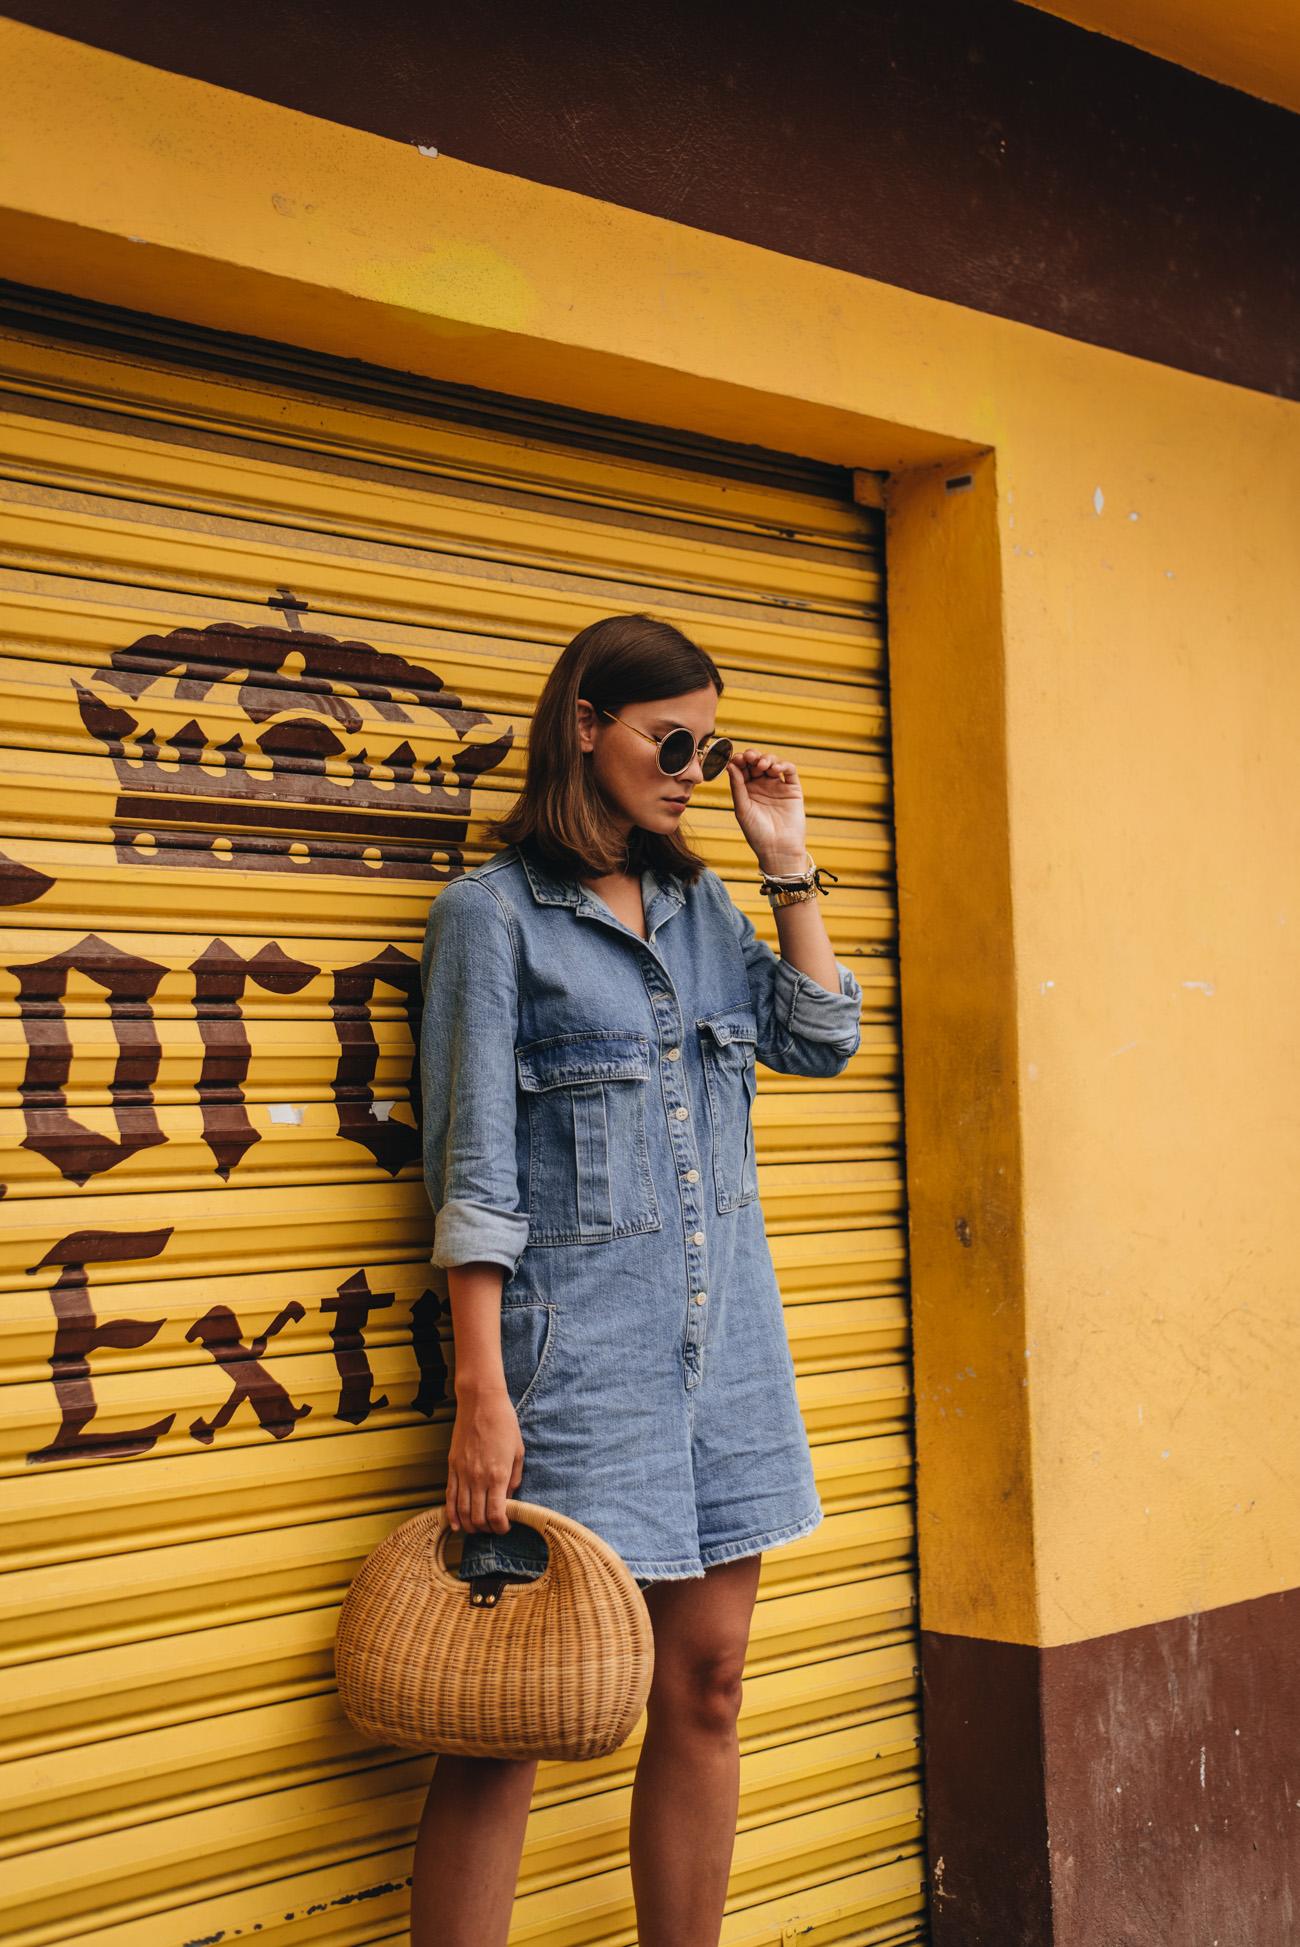 german-fashion-beauty-lifesyle-blogger-influencer-high-end-luxury-nina-schwichtenberg-fashiioncarpet